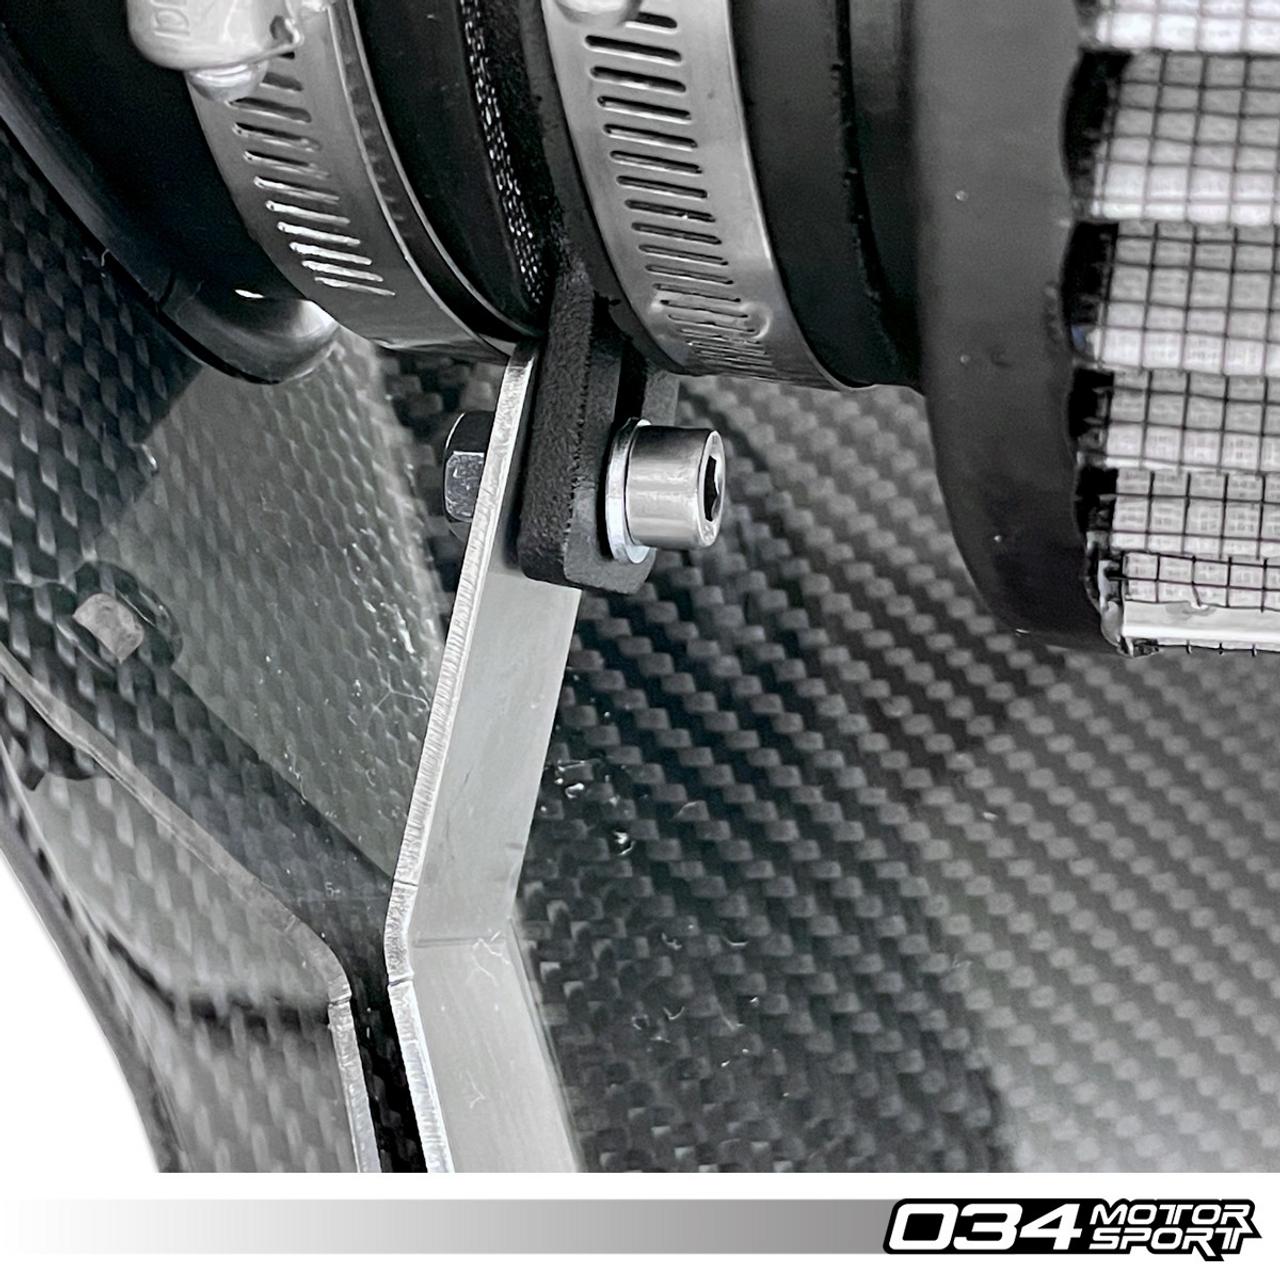 X34 Carbon Fiber Intake - Audi B8/B8.5 S4/S5 3.0TFSI